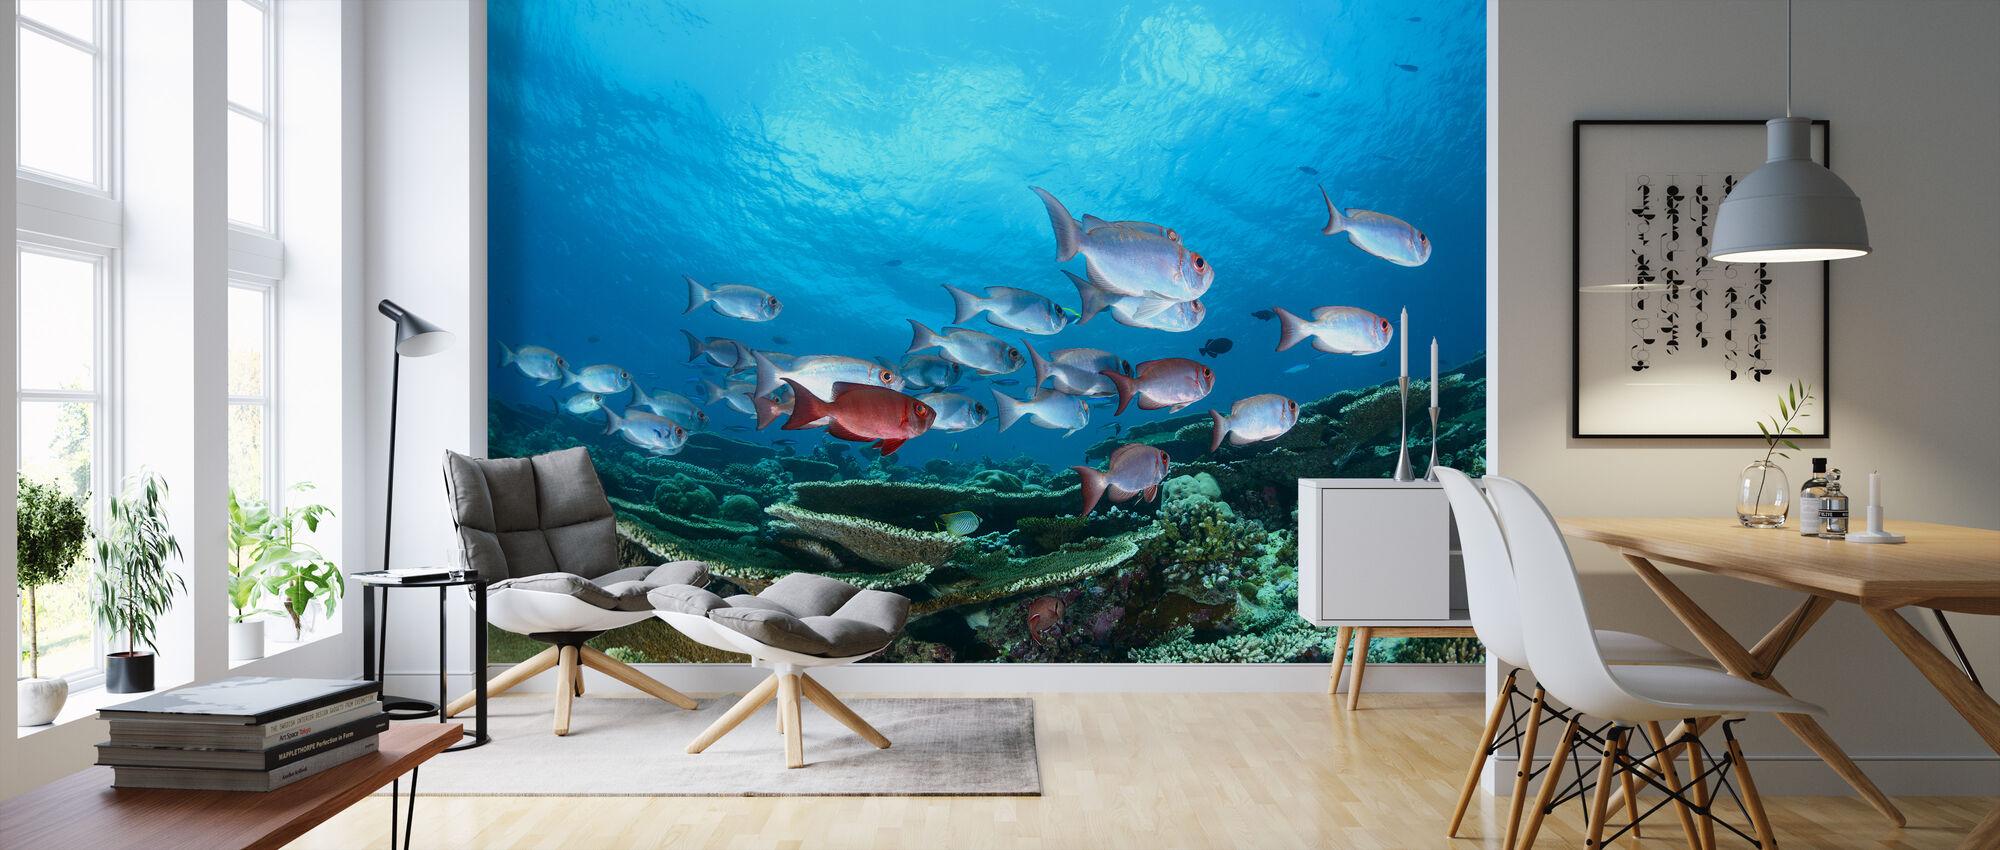 Enchanthed Gardens - Wallpaper - Living Room